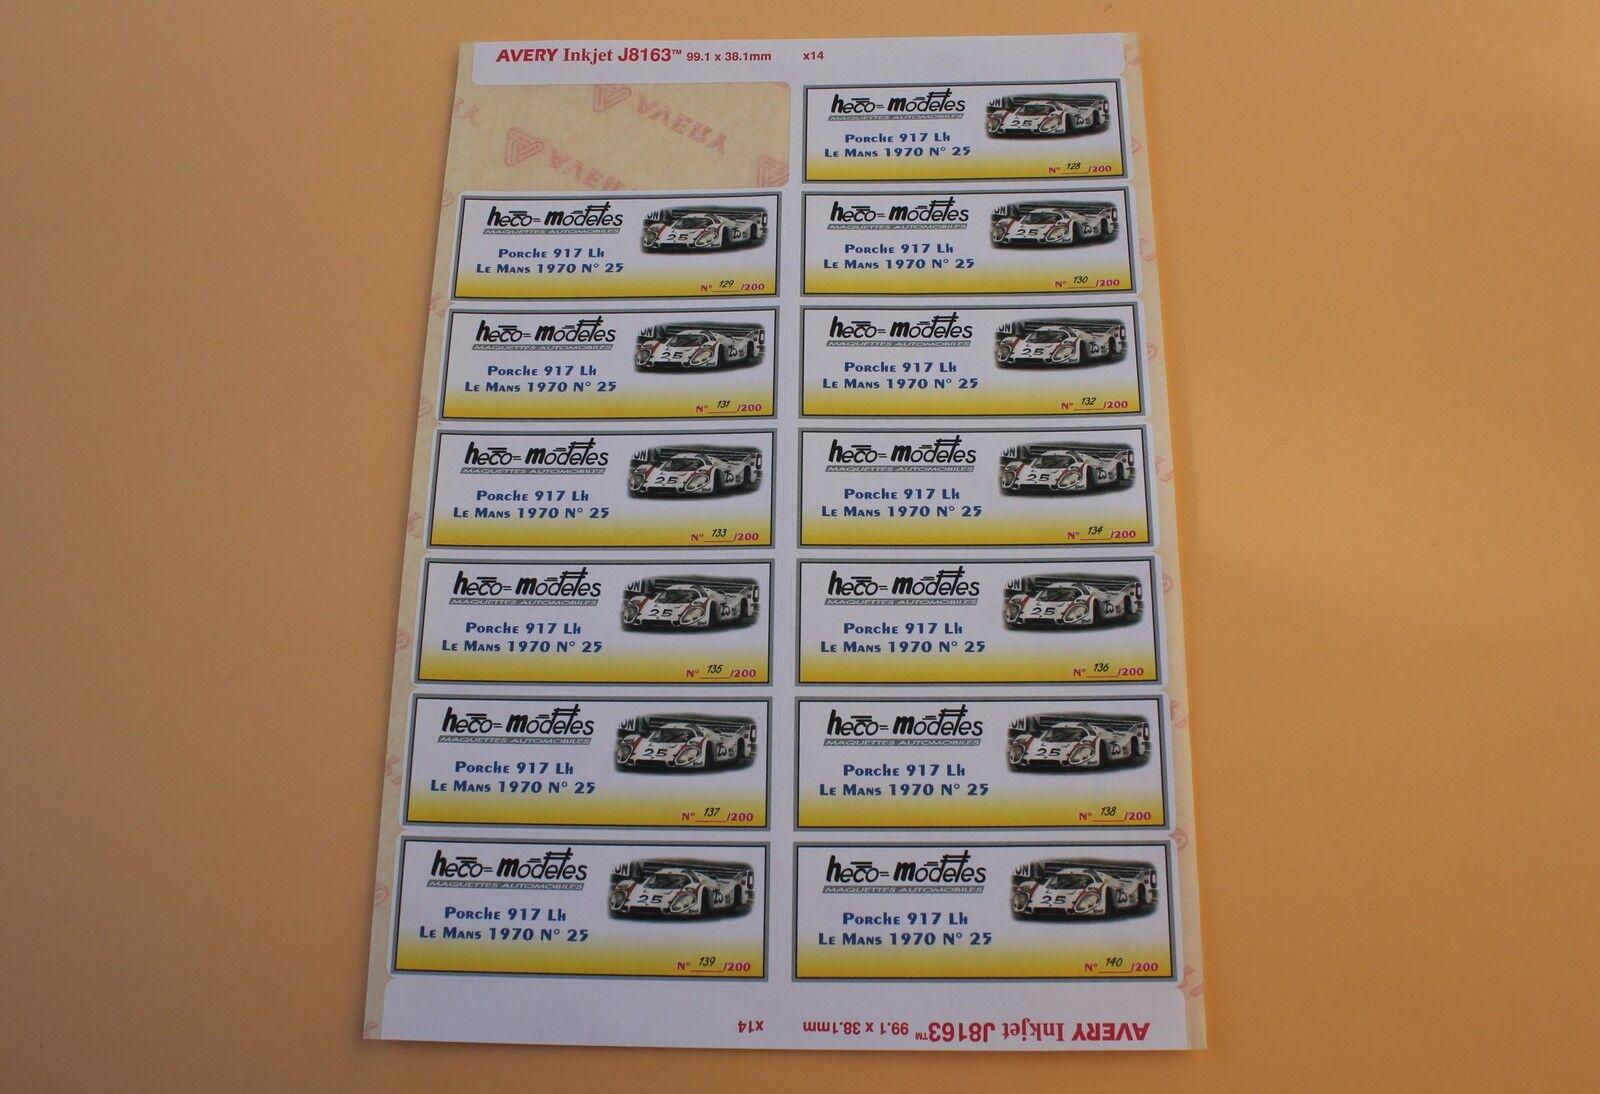 Qgb 1 Tabla 13 Ex Etiqueta Pegatina Porsche 917 LH Me Mans 1970 N º 25 Heco